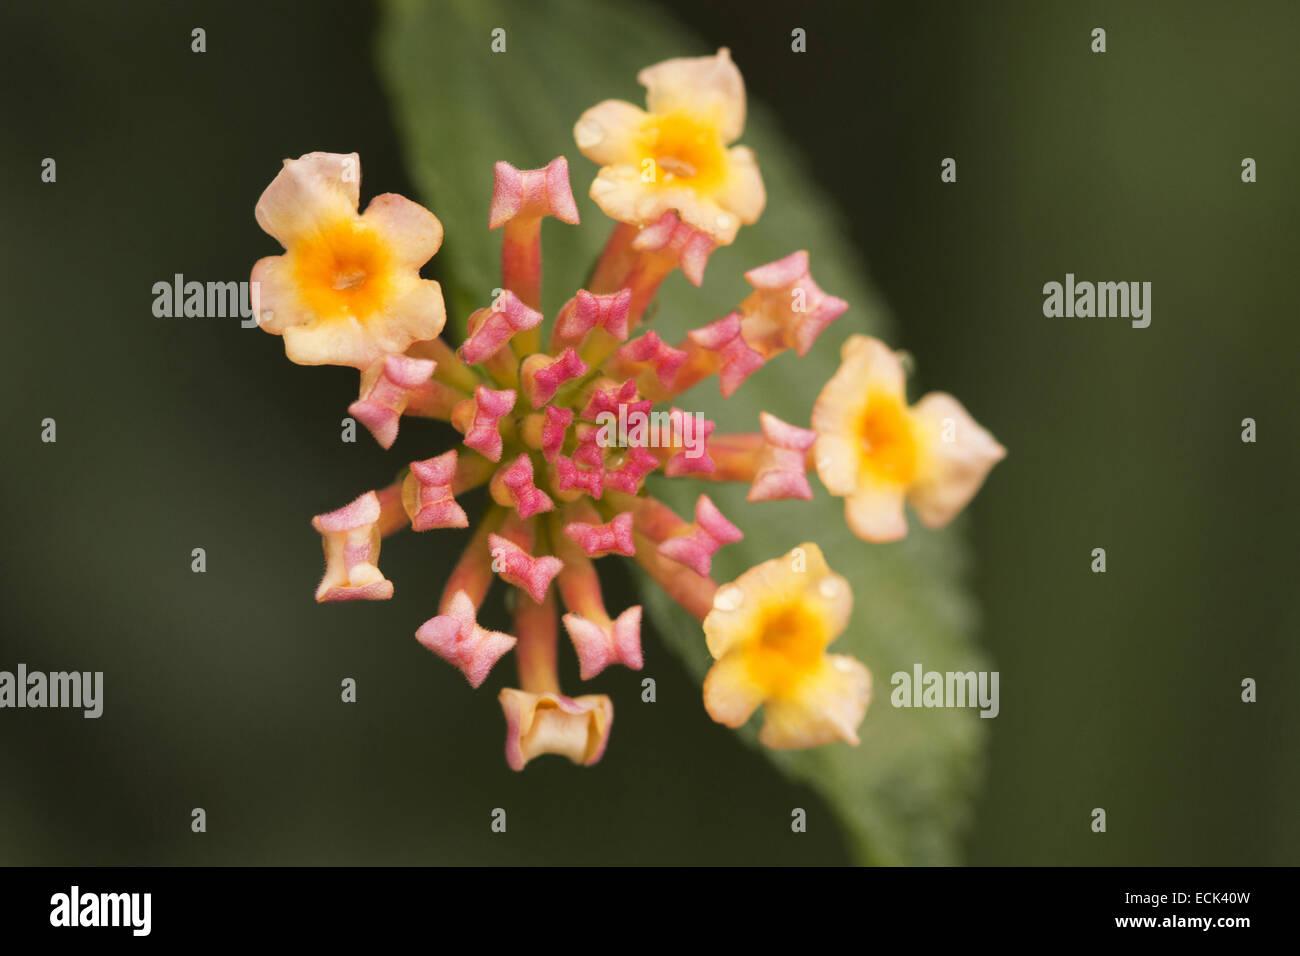 Lantana flowers, Maharashtra, India - Stock Image